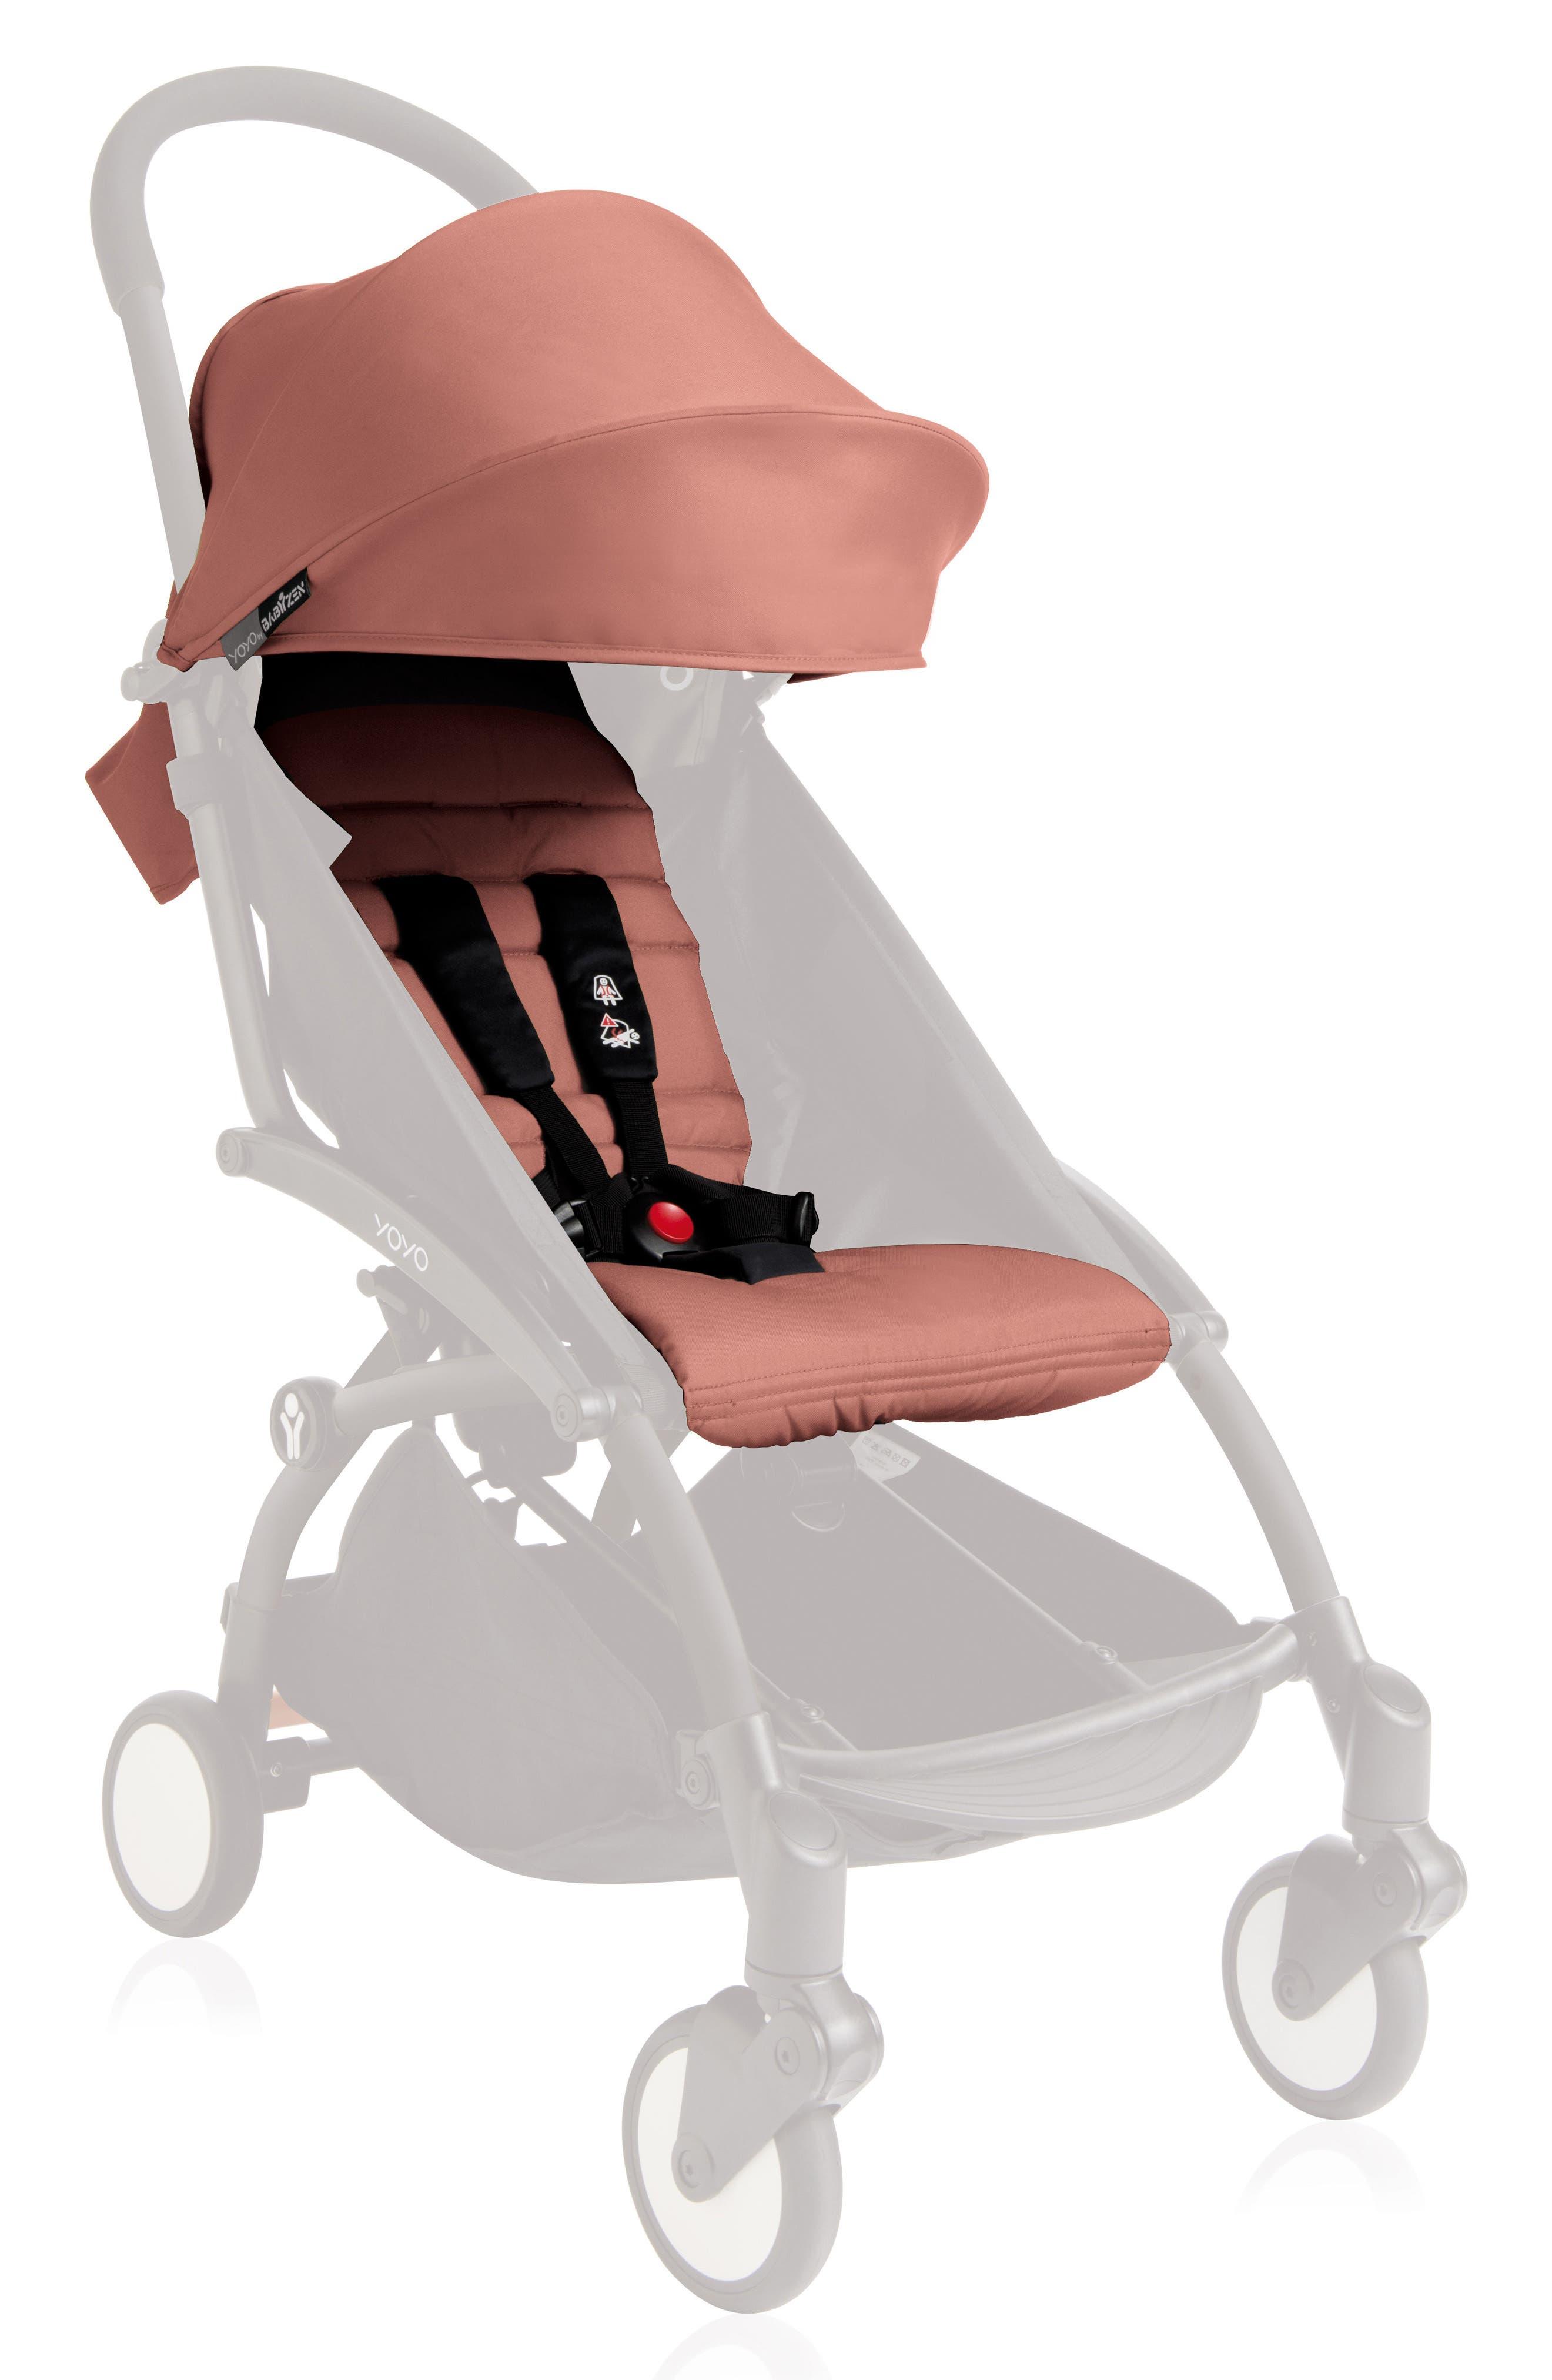 Alternate Image 1 Selected - BABYZEN YOYO+ Color Pack Seat/Fabric Set for BABYZEN YOYO+ Stroller Frame